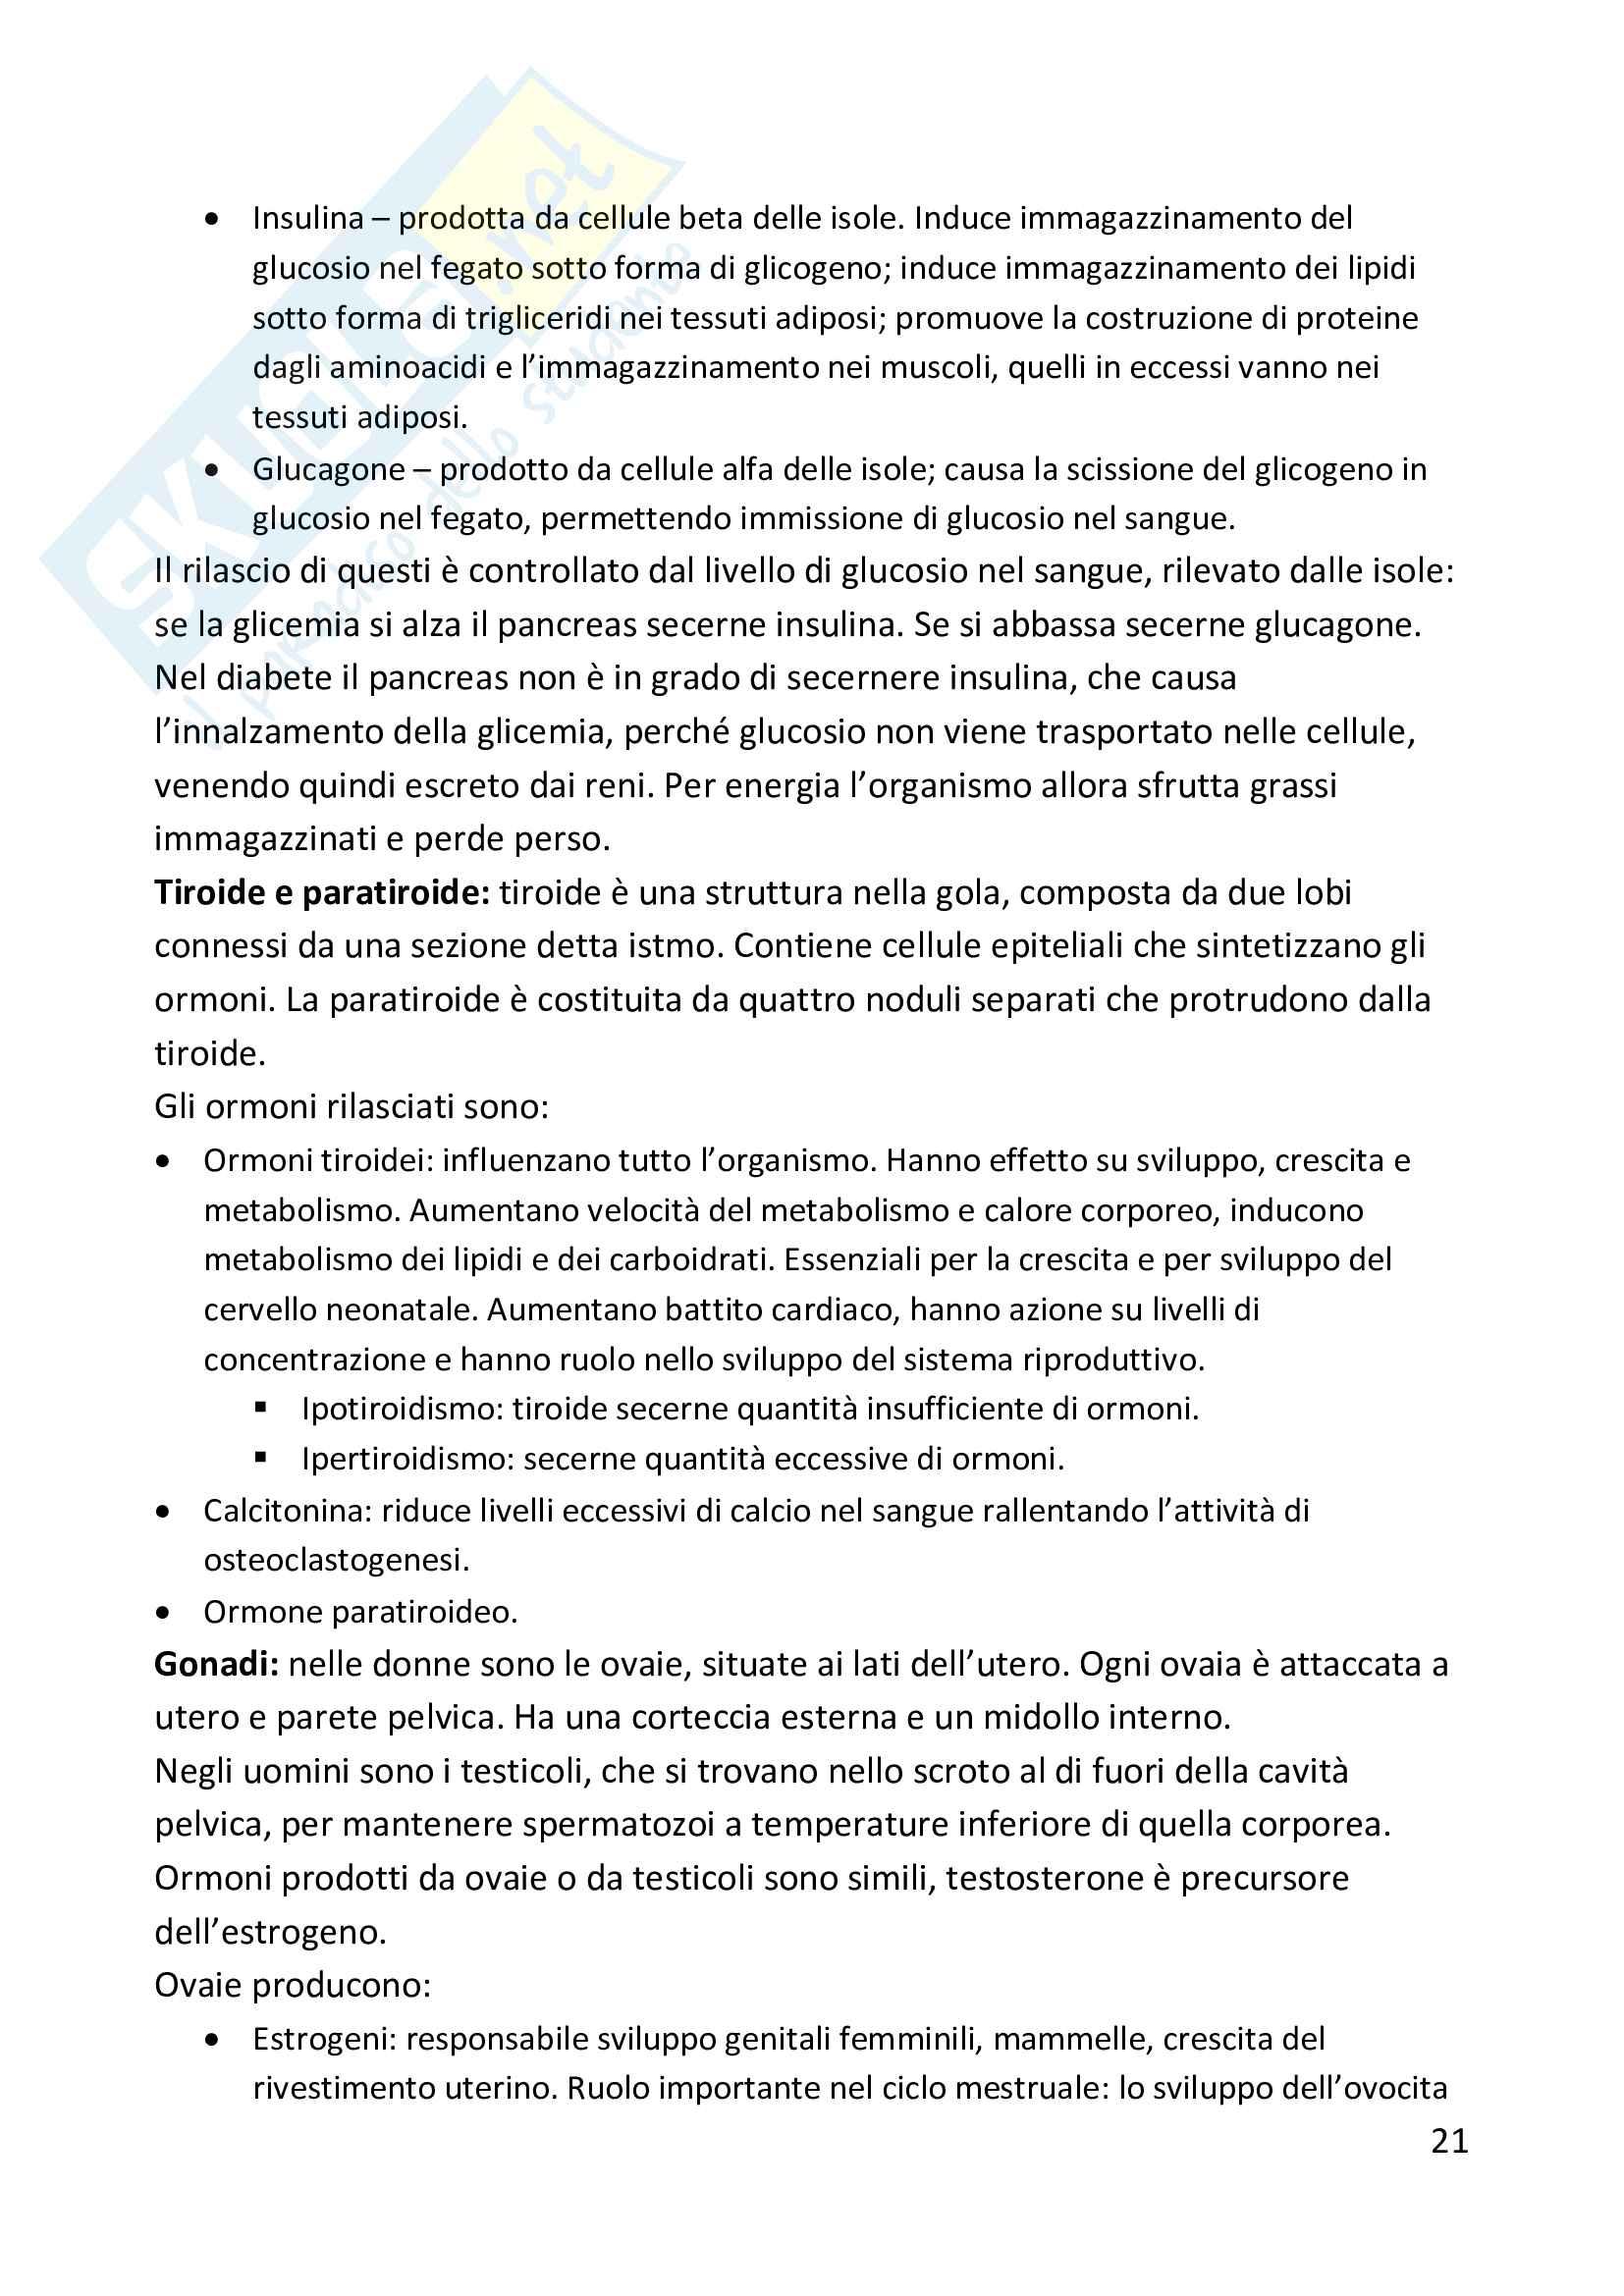 Riassunto esame psicologia fisiologica, prof Cauda, libro Psicologia Fisiologica, Wagner, Silber Pag. 21